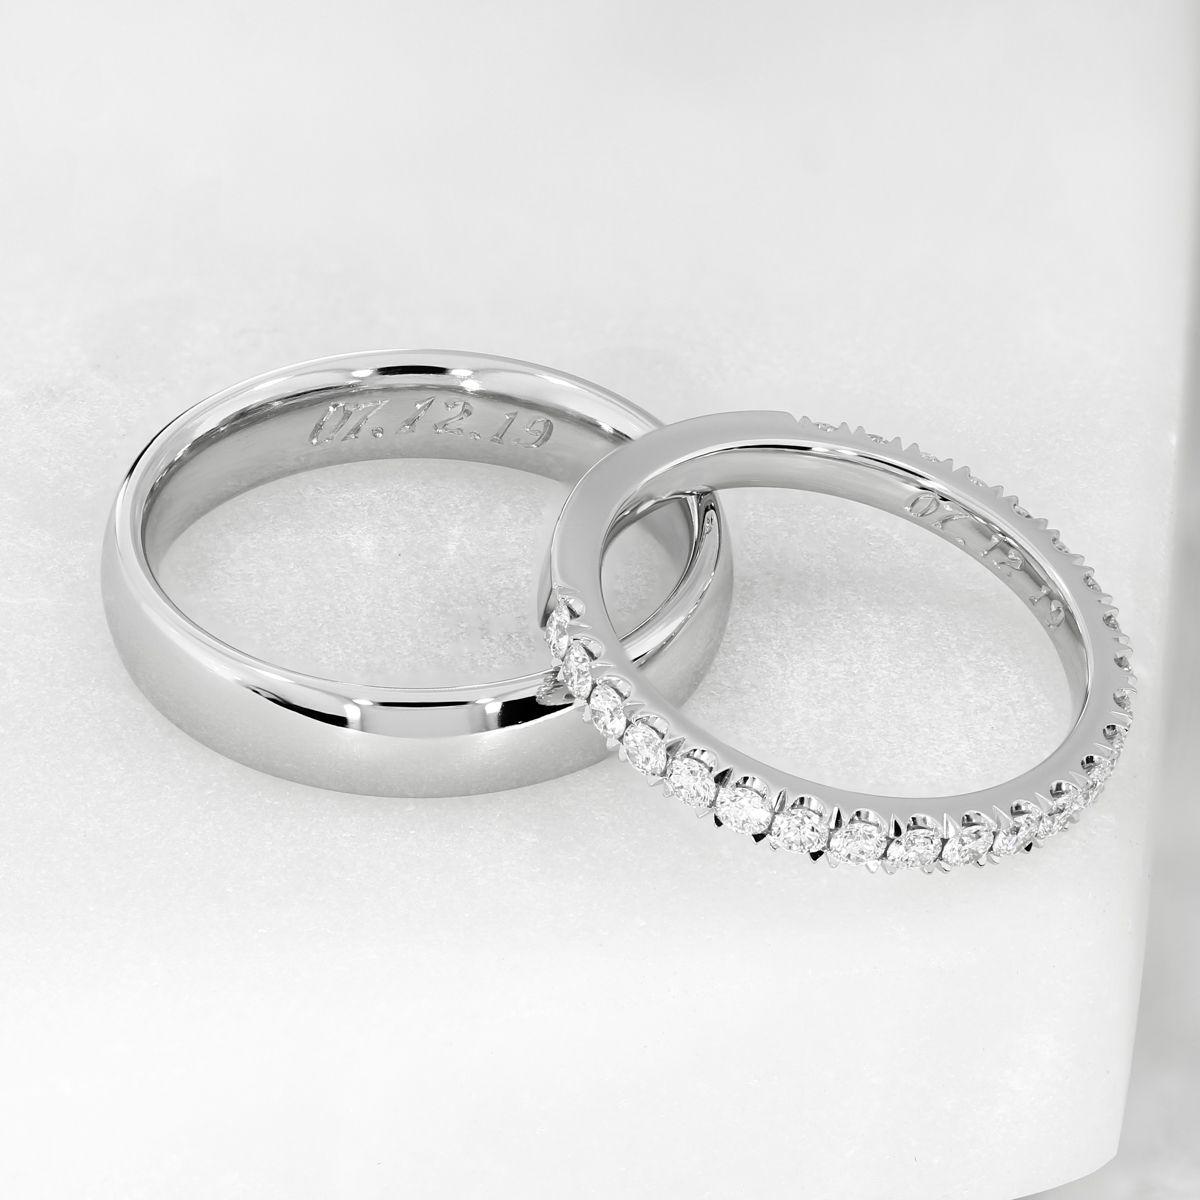 25+ Wedding ring engraving ideas ideas